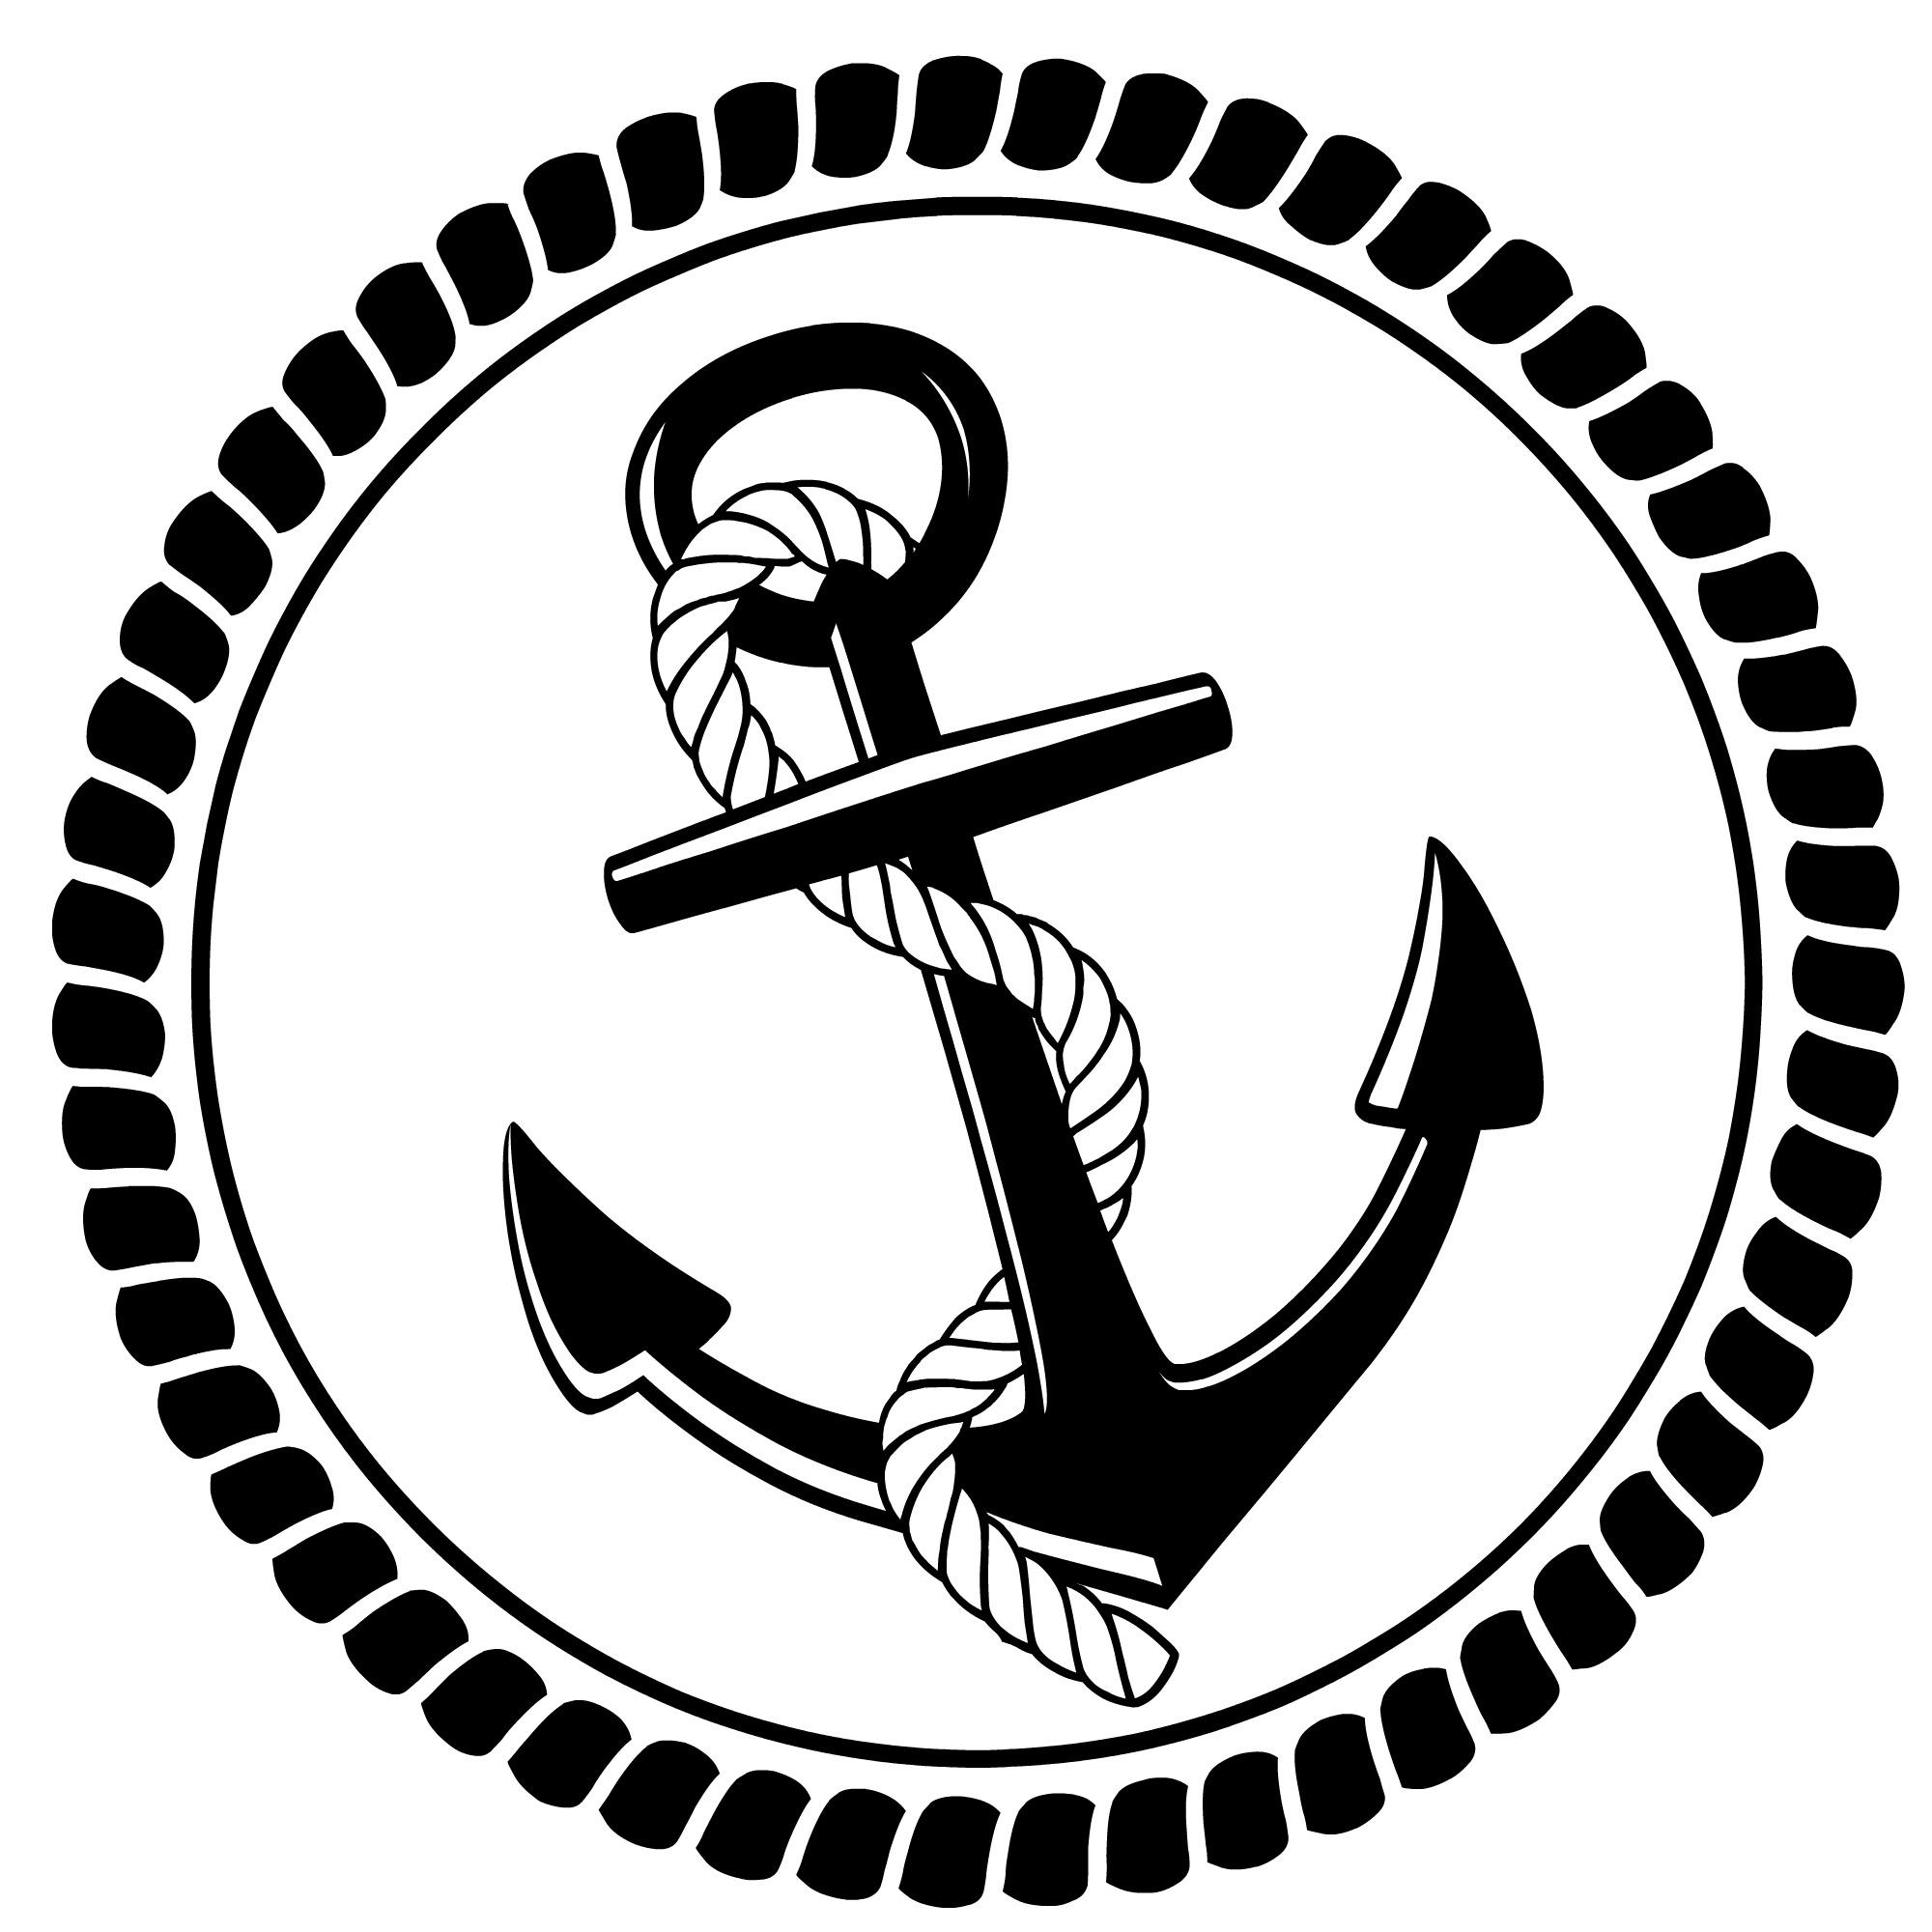 Clipart anchor logo vector transparent library Clipart anchor logo - ClipartFest vector transparent library